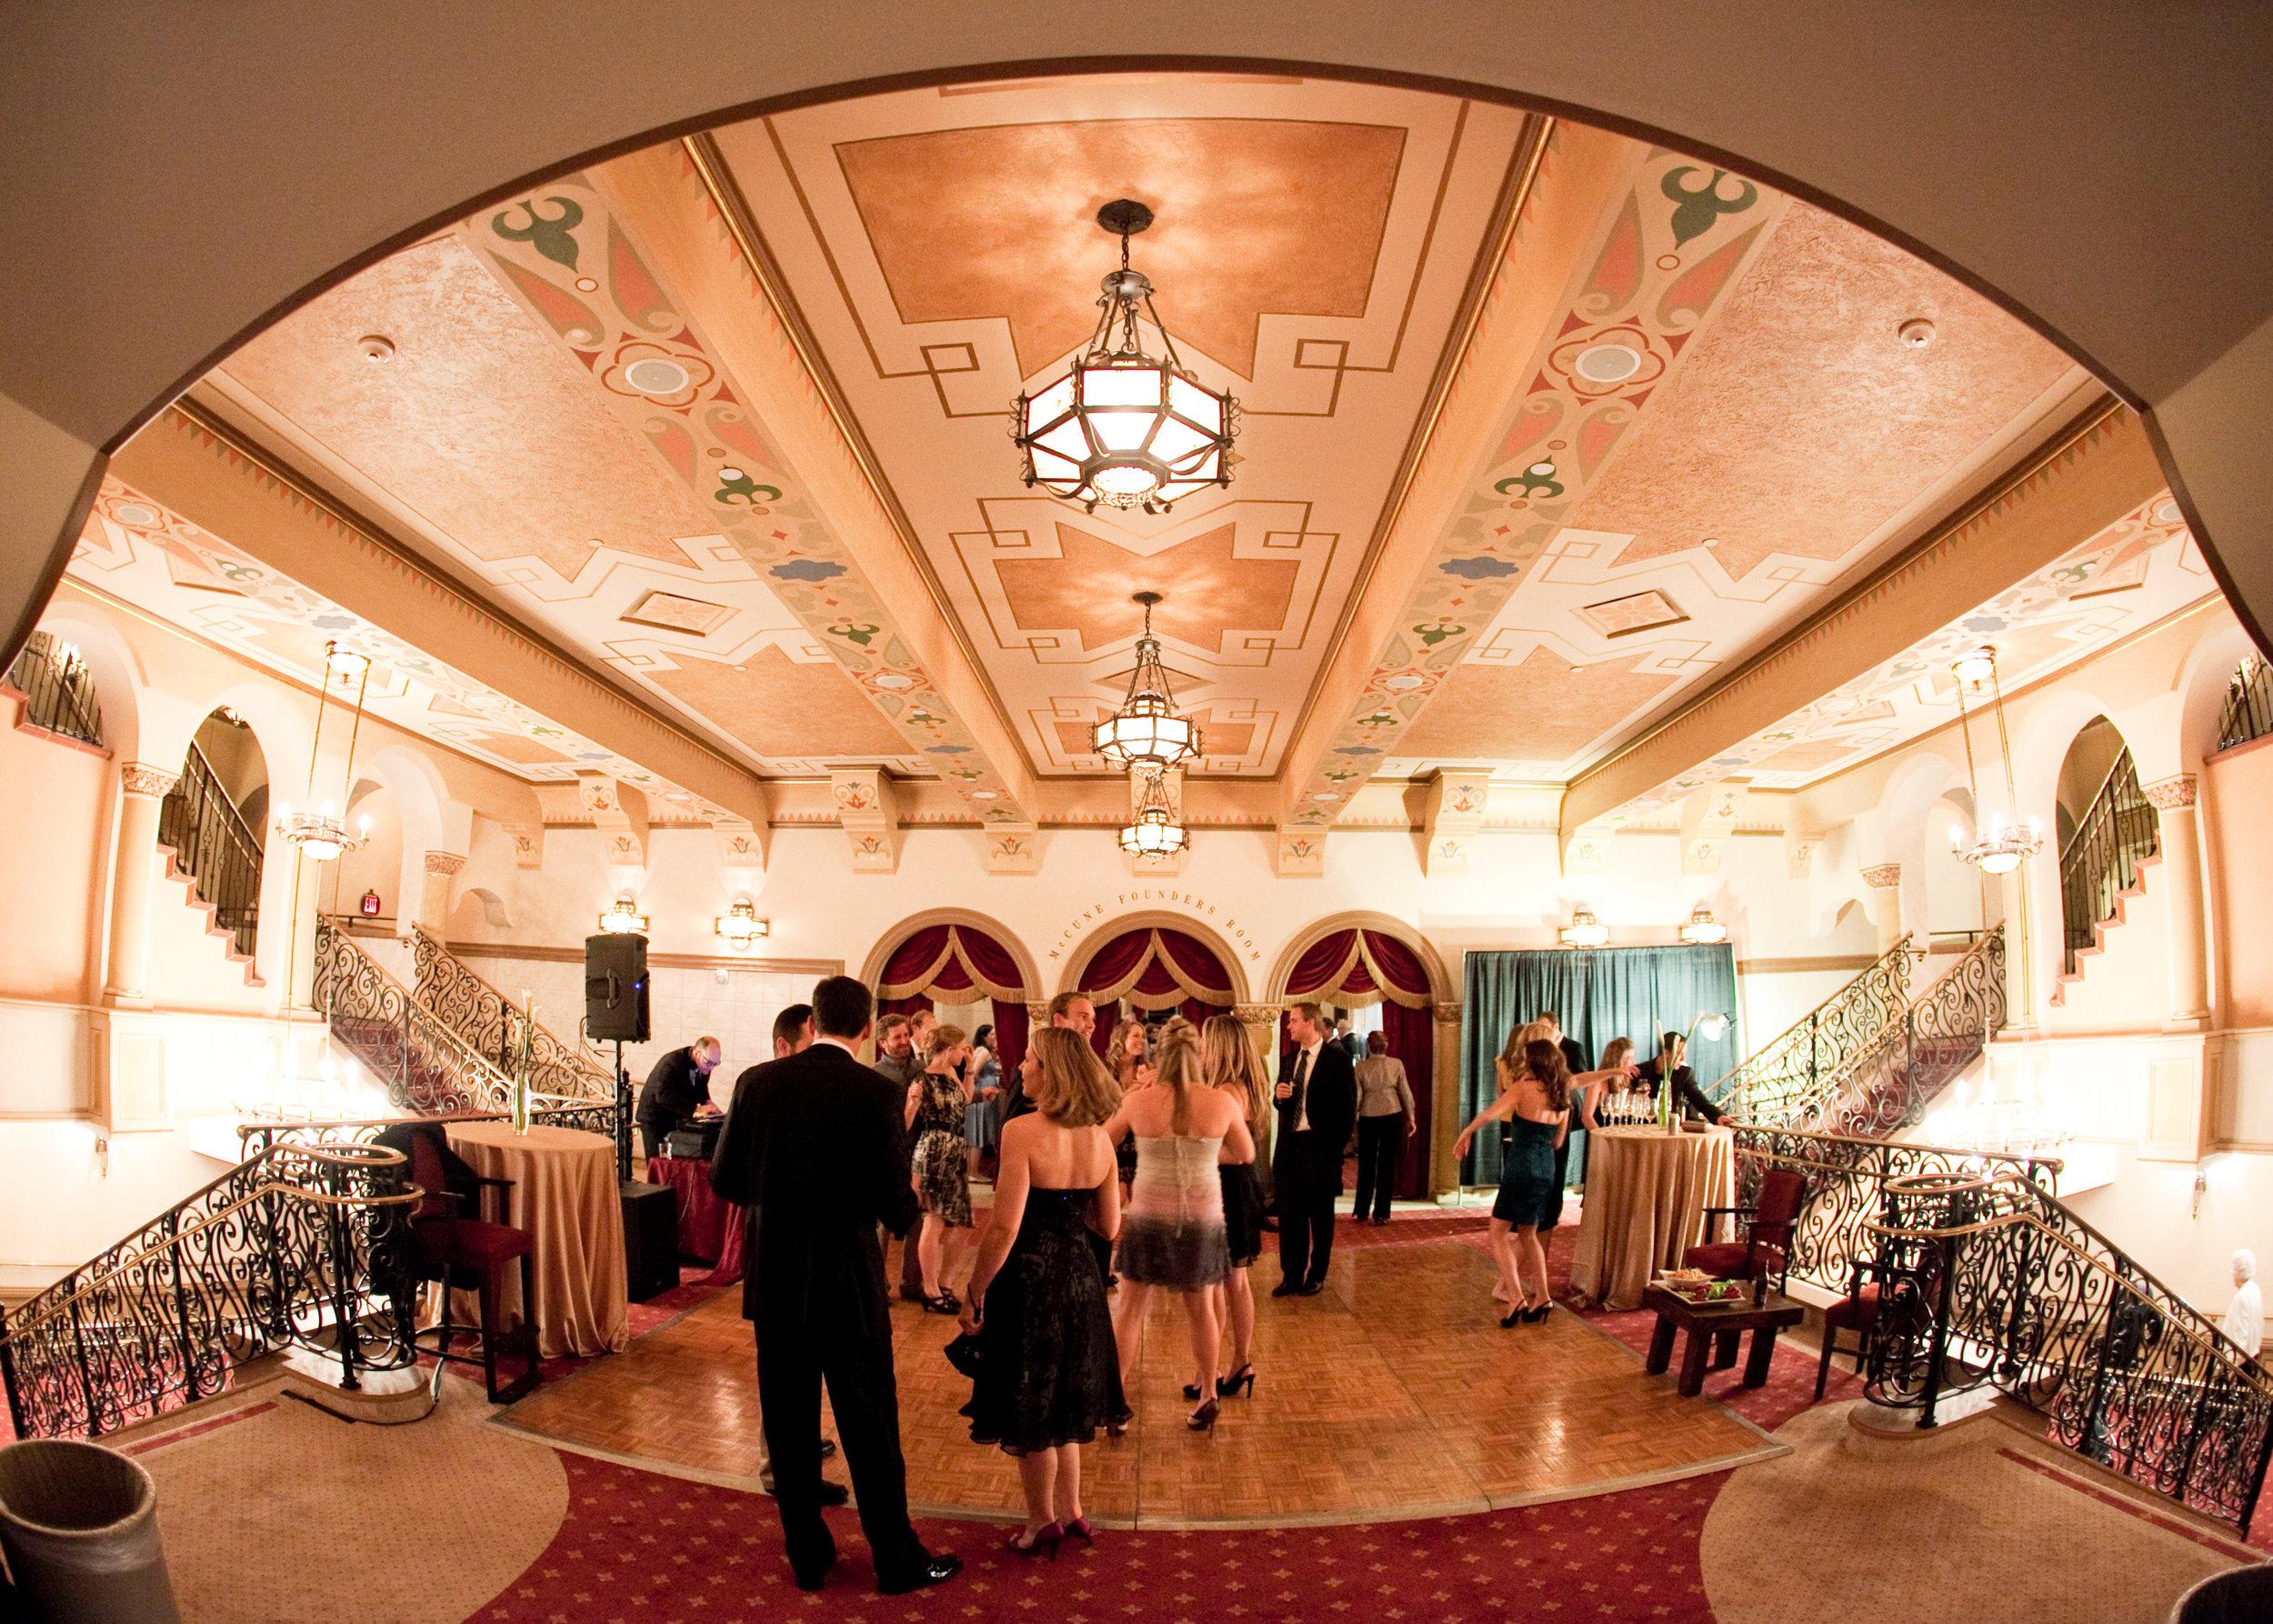 santabarbarawedding.com   The Granada Theatre   Theater Venue   Location Wedding Ceremony   Reception Venue   McCune Foyer